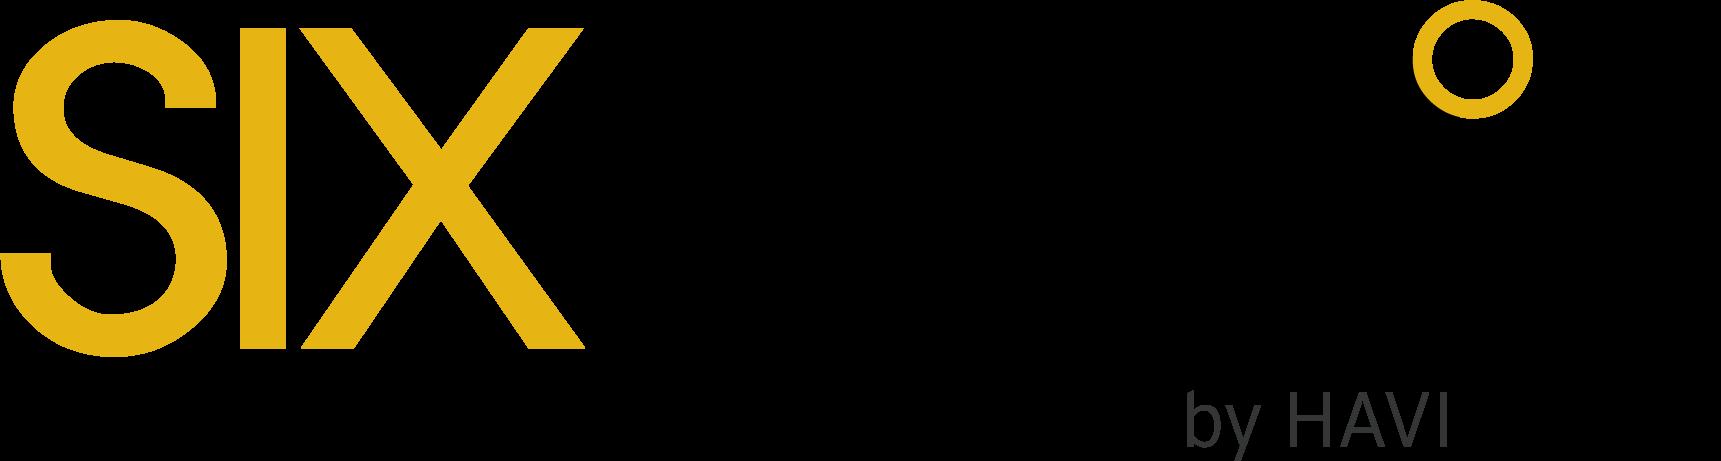 SIX500 by HAVI Logo